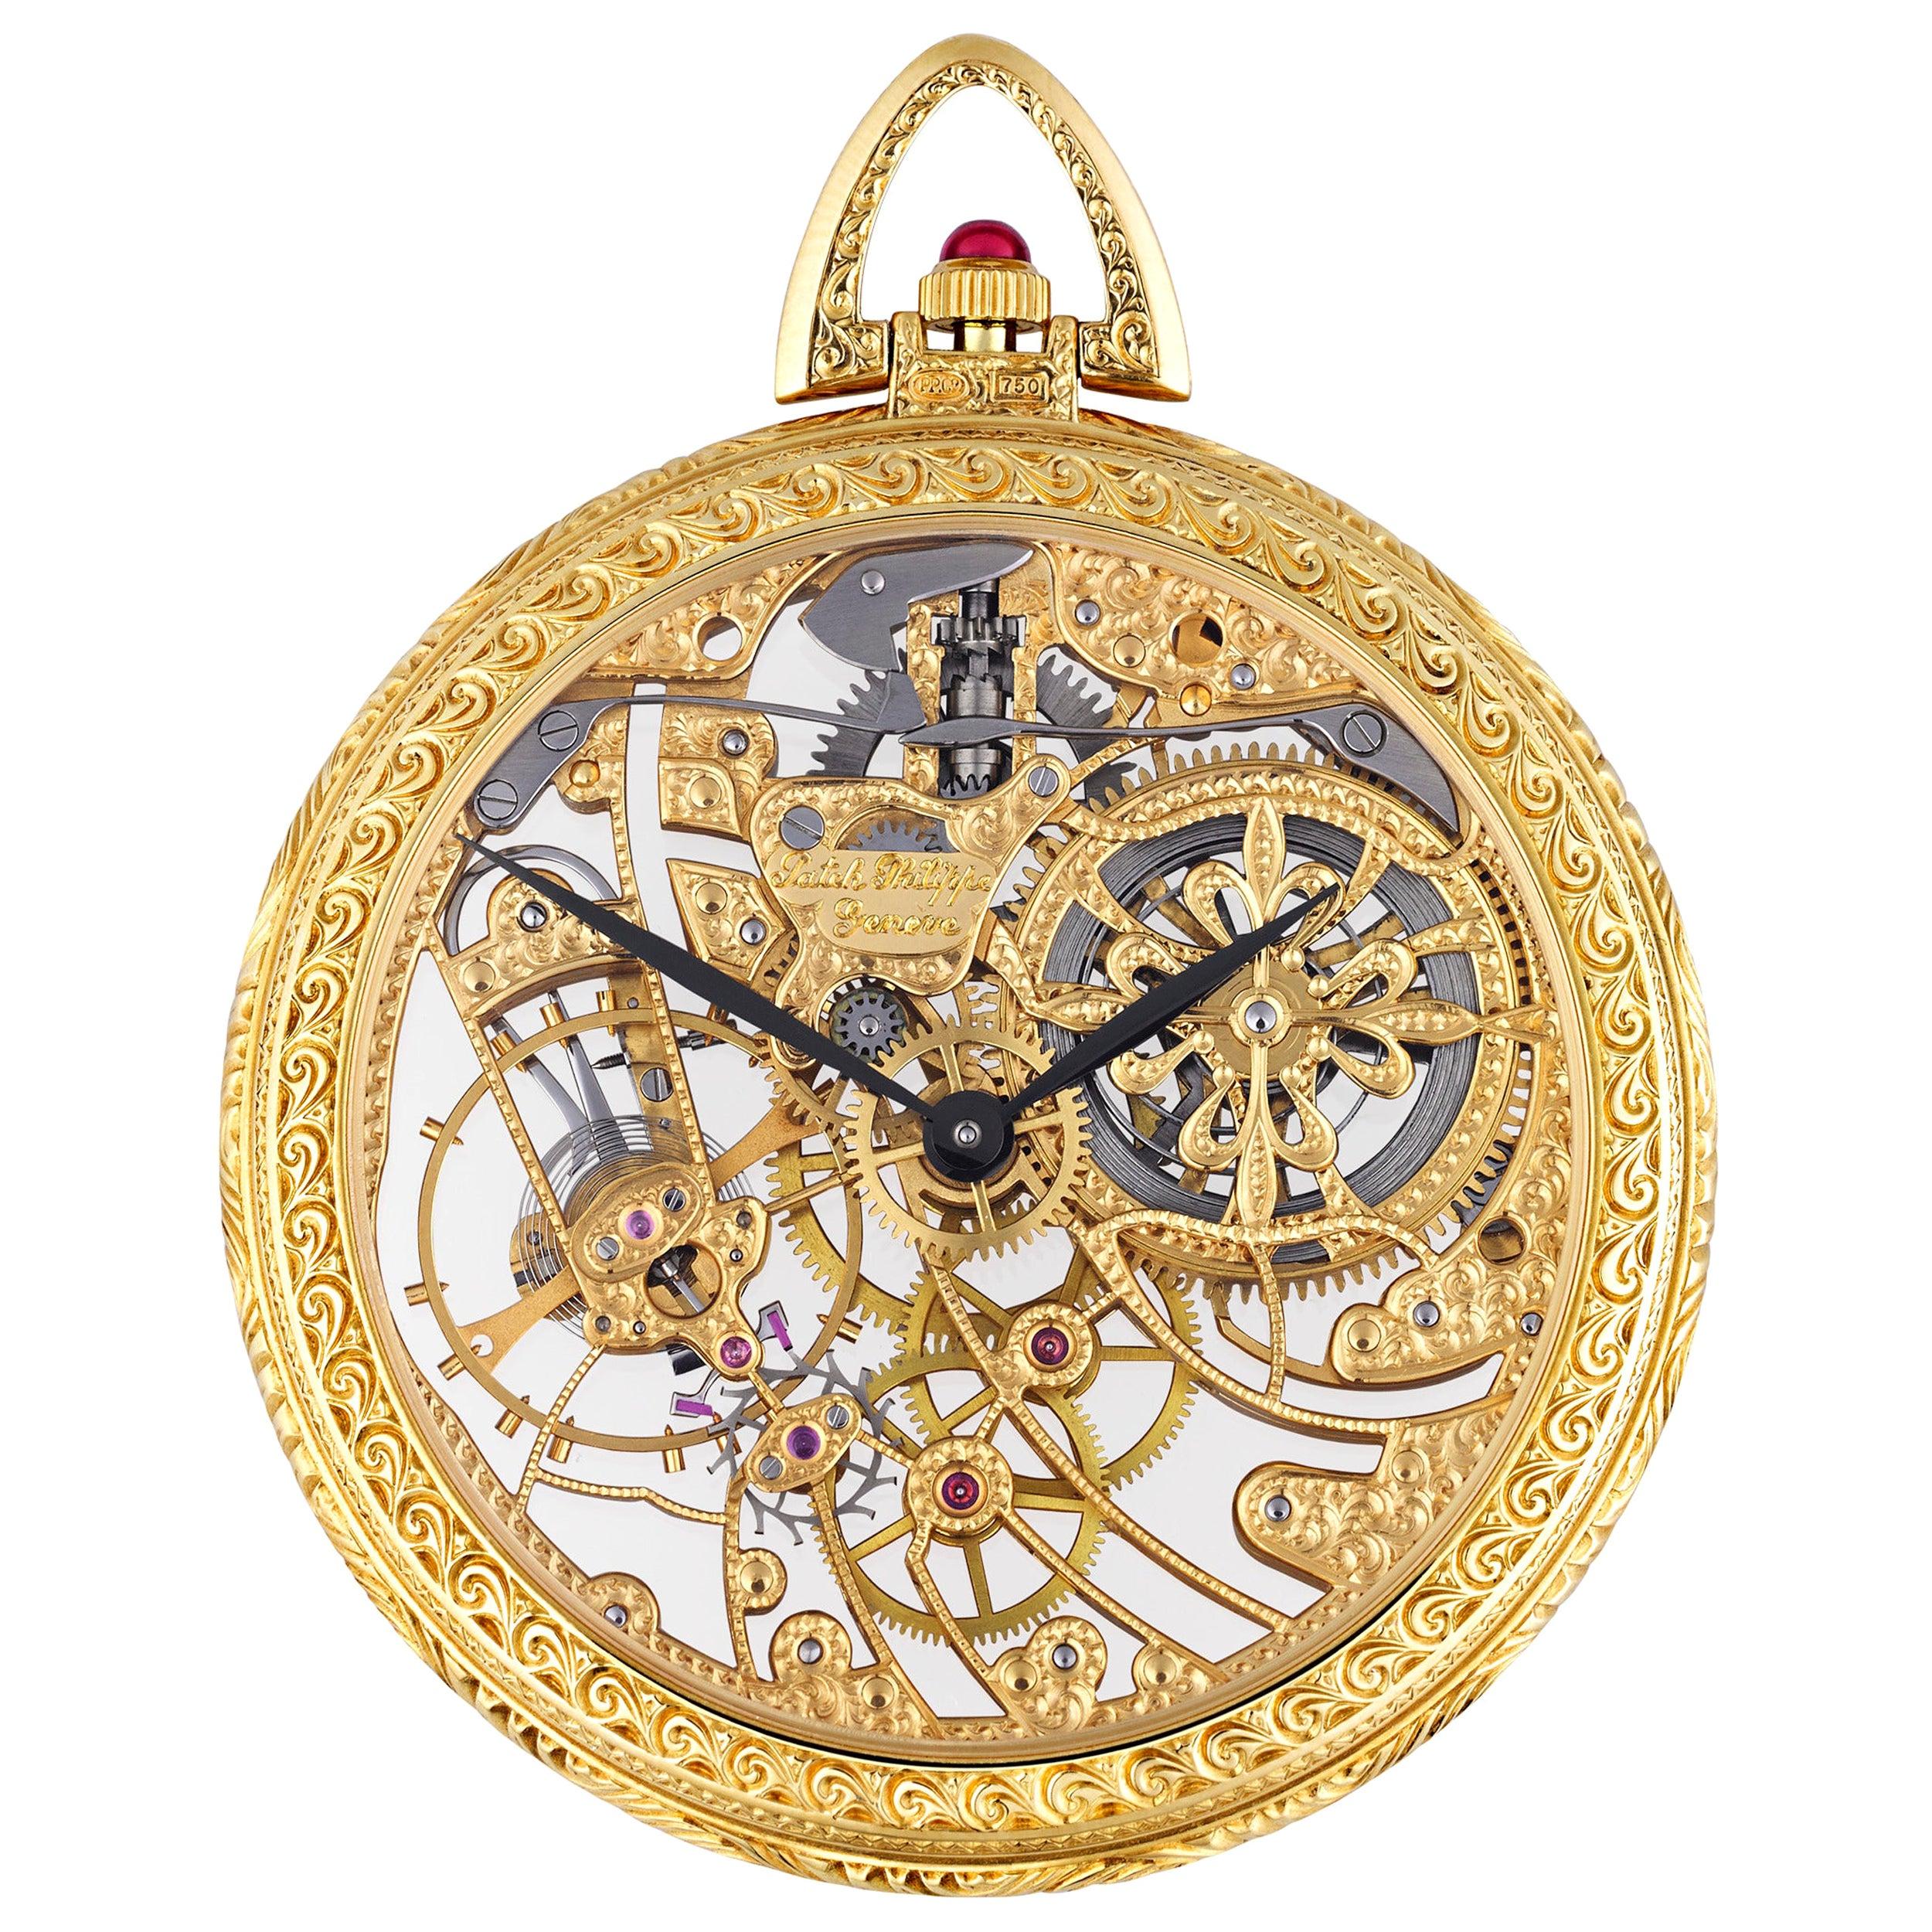 Patek Philippe Squelette Pocket Watch